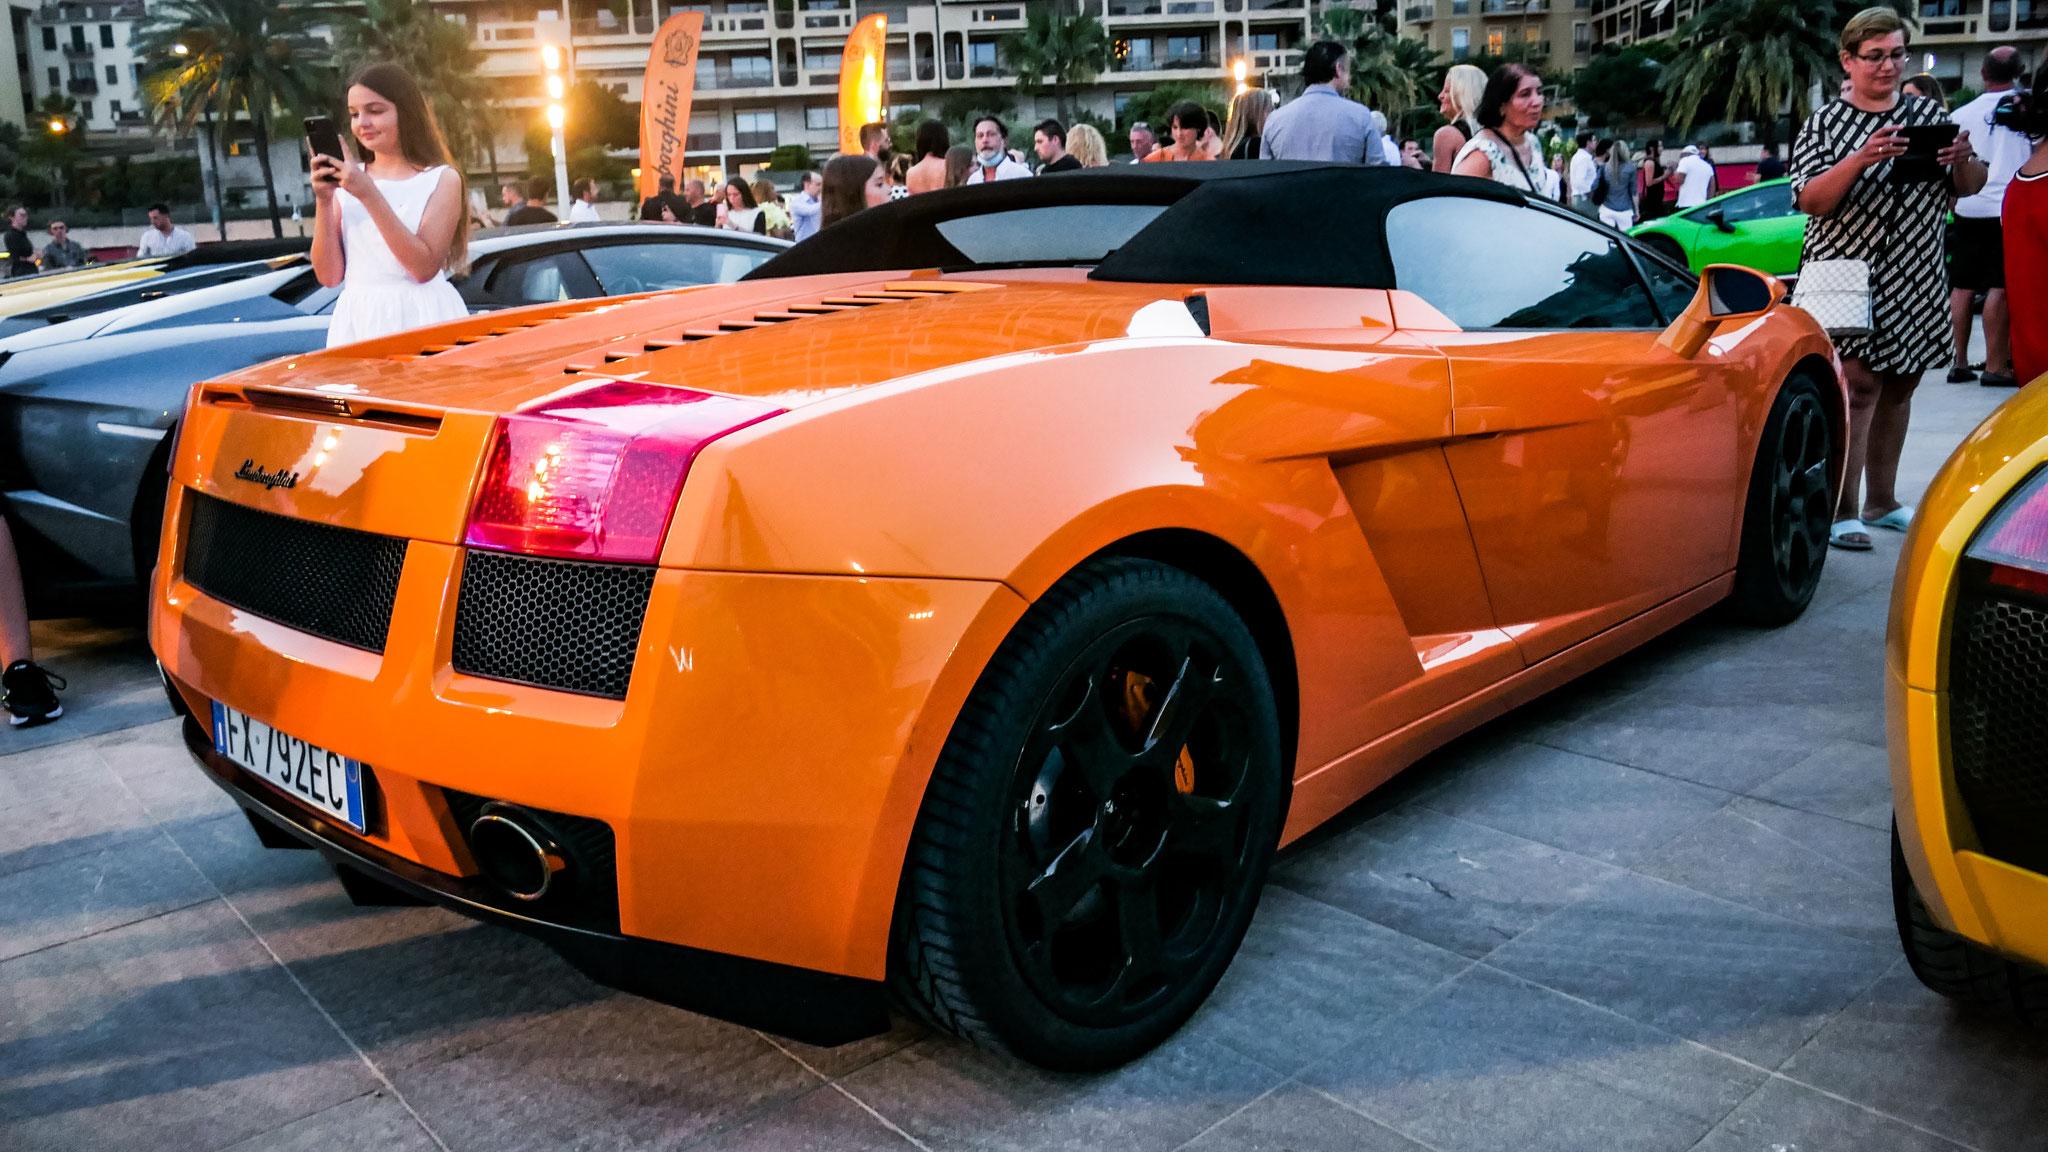 Lamborghini Gallardo Spyder - FX-792-EC (ITA)